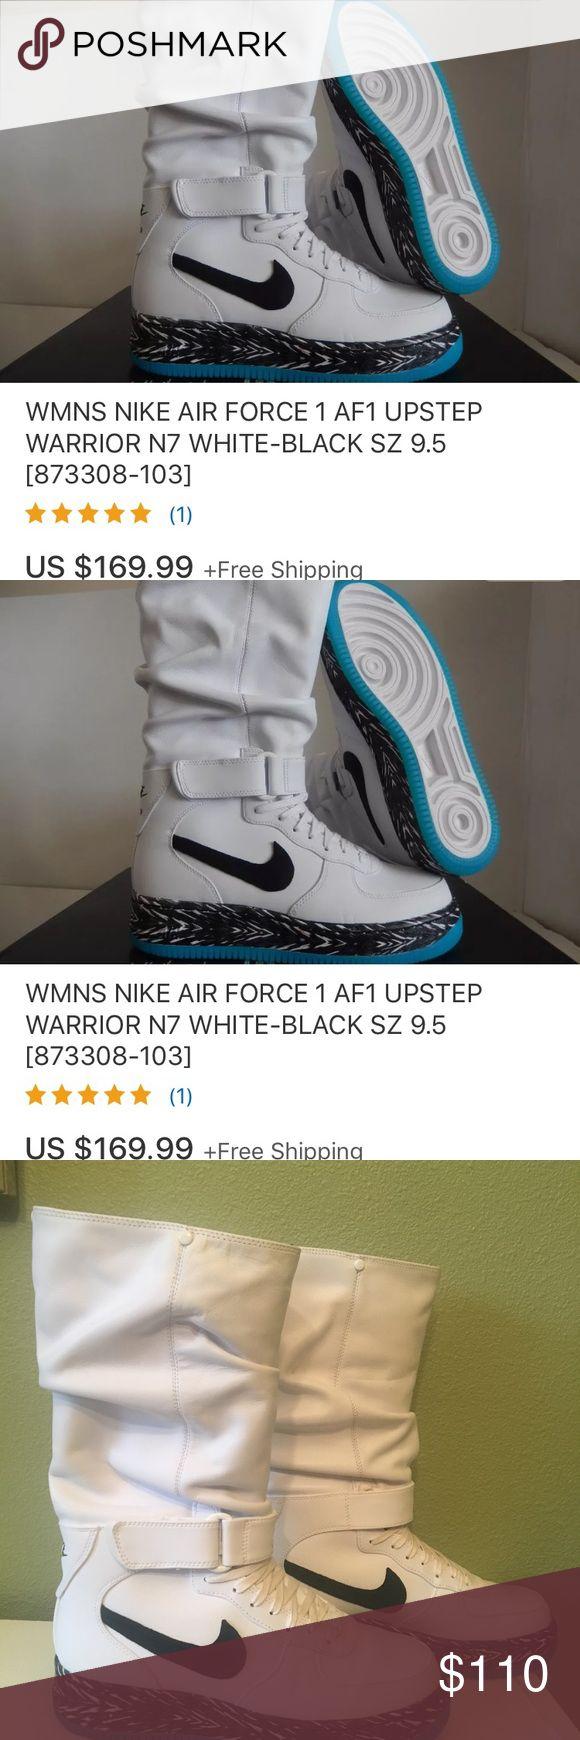 NIKE Woman's AIR FORCE 1 UPSTEP WARRIOR N7 size 10